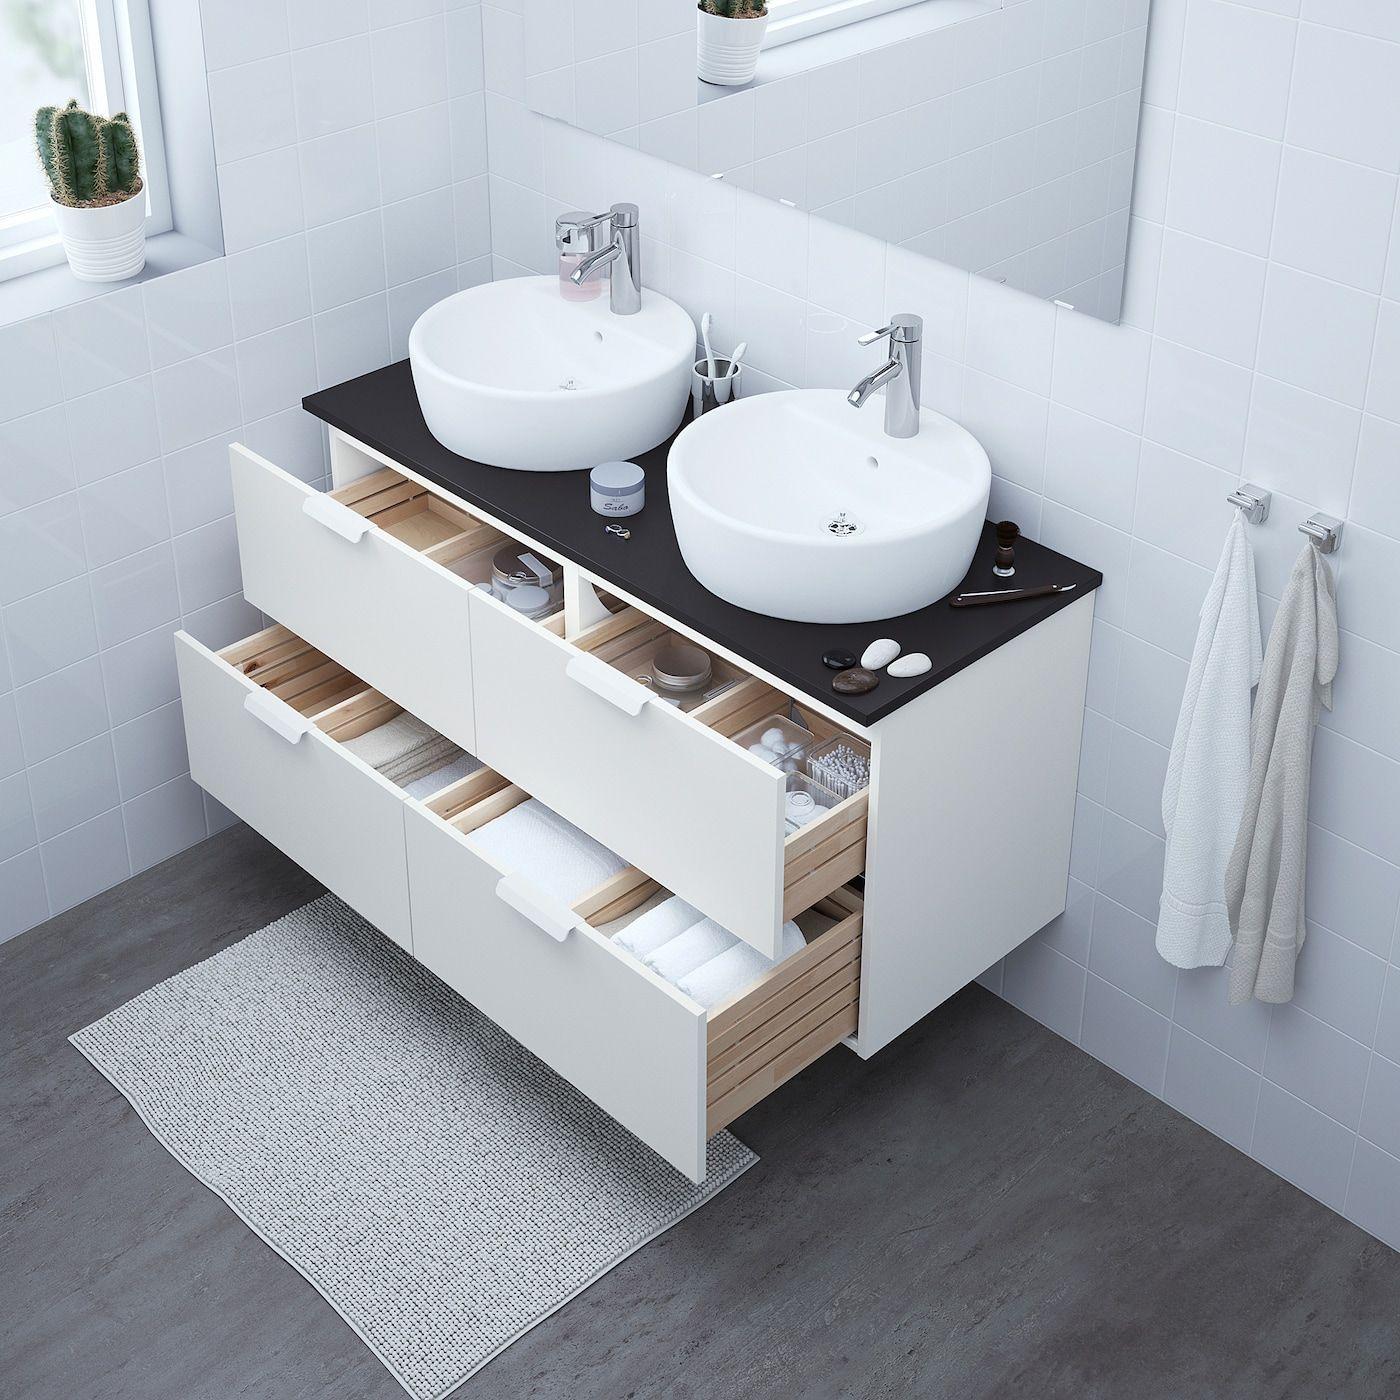 Godmorgon Tolken Tornviken Bathroom Vanity White Anthracite Dalskar Faucet 48x19 1 4x29 1 8 122x49x74 Cm In 2020 Ikea Godmorgon White Vanity Bathroom Sink Cabinet